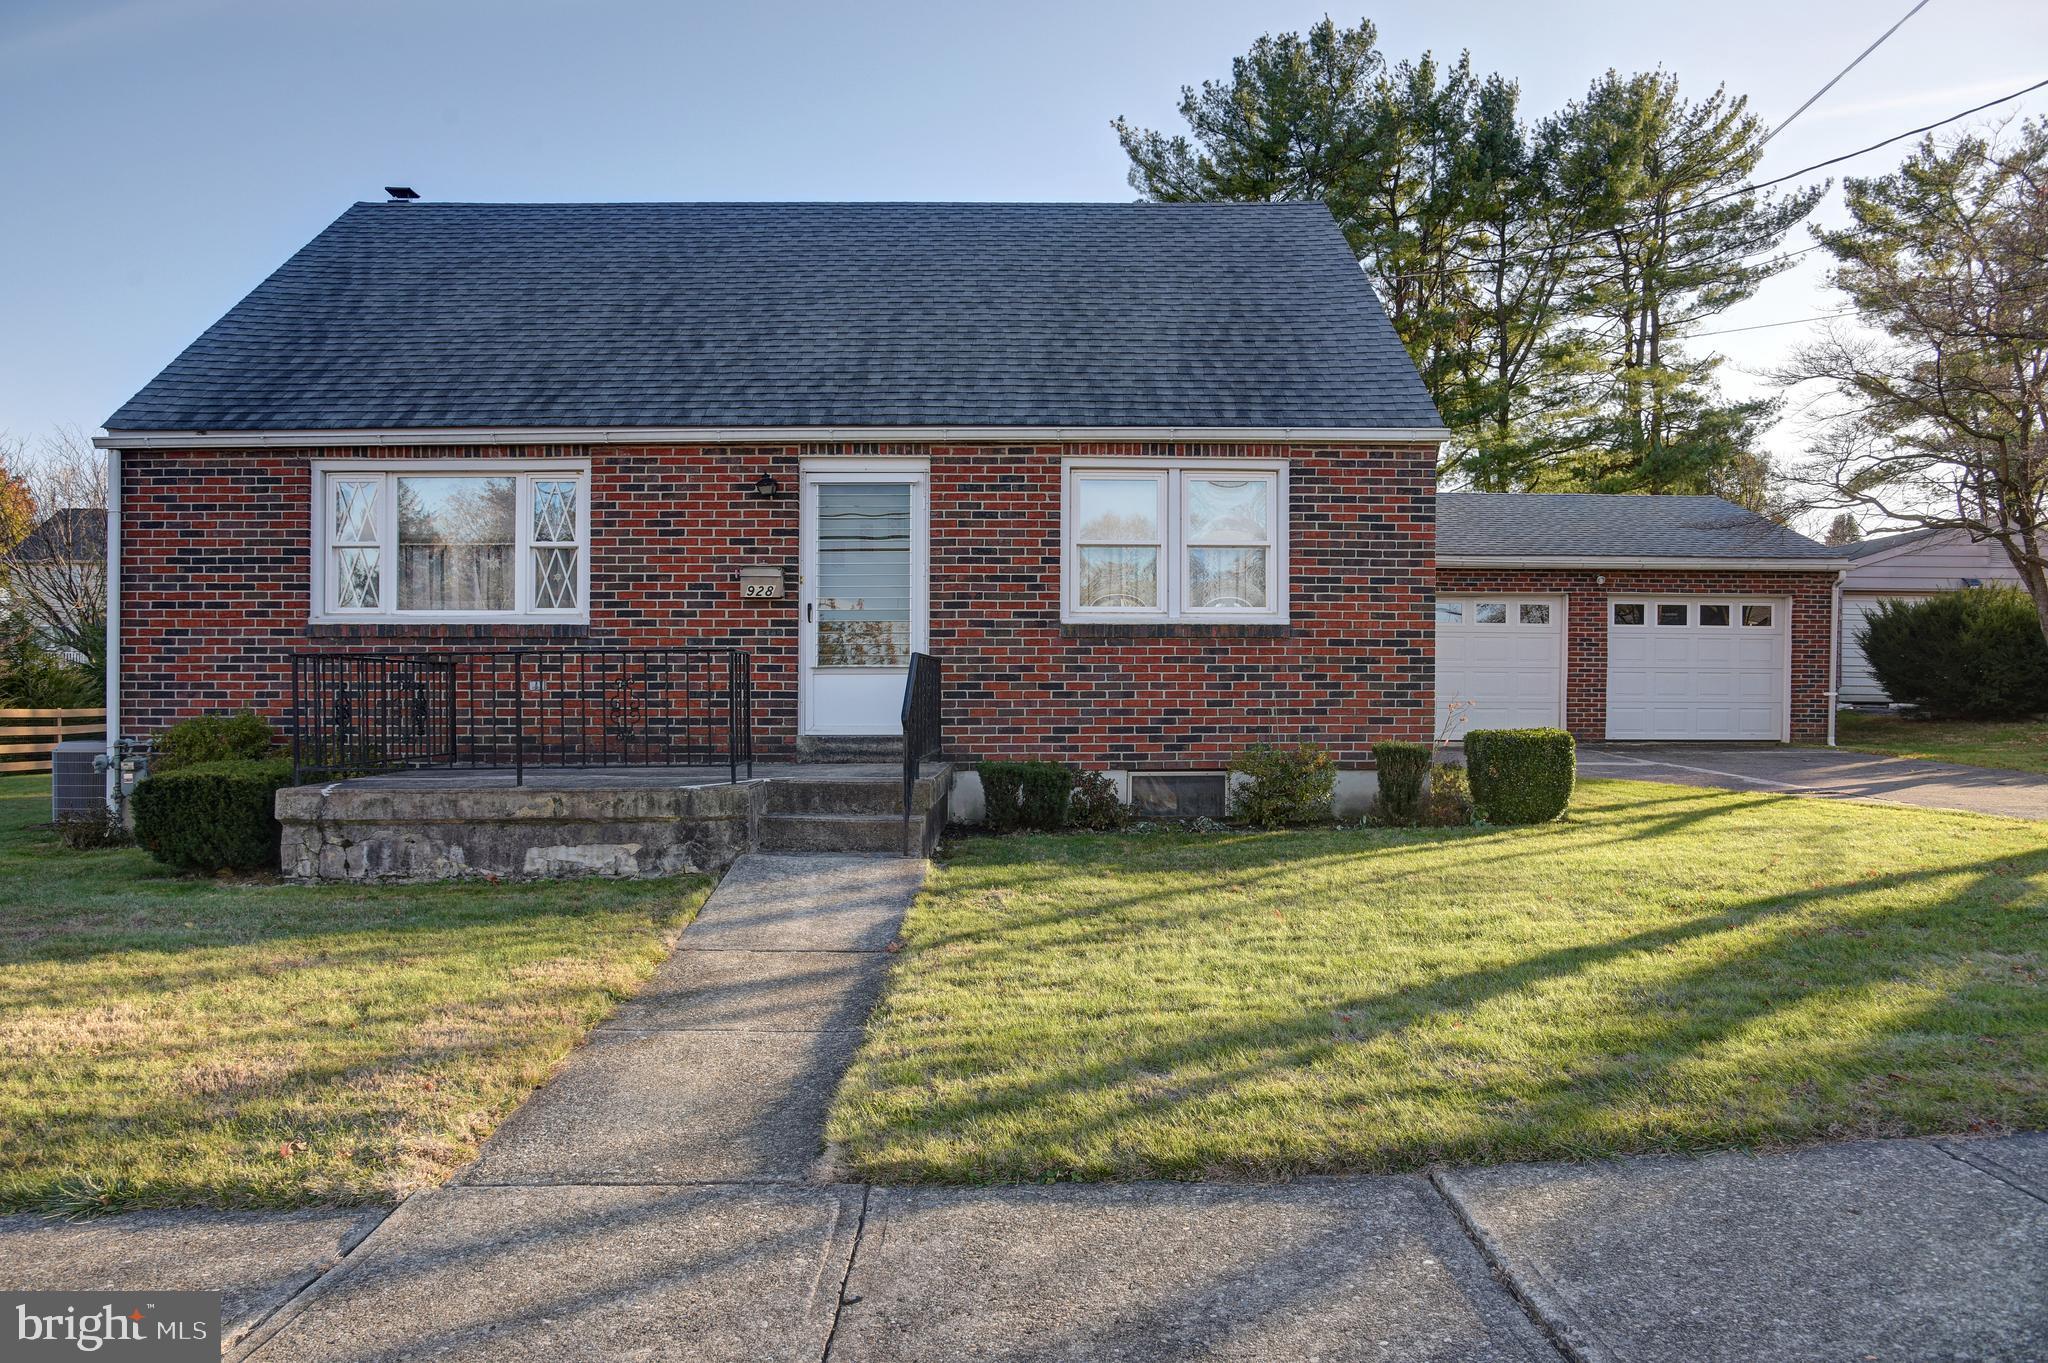 928 TOLSTOY STREET, BETHLEHEM, PA 18017